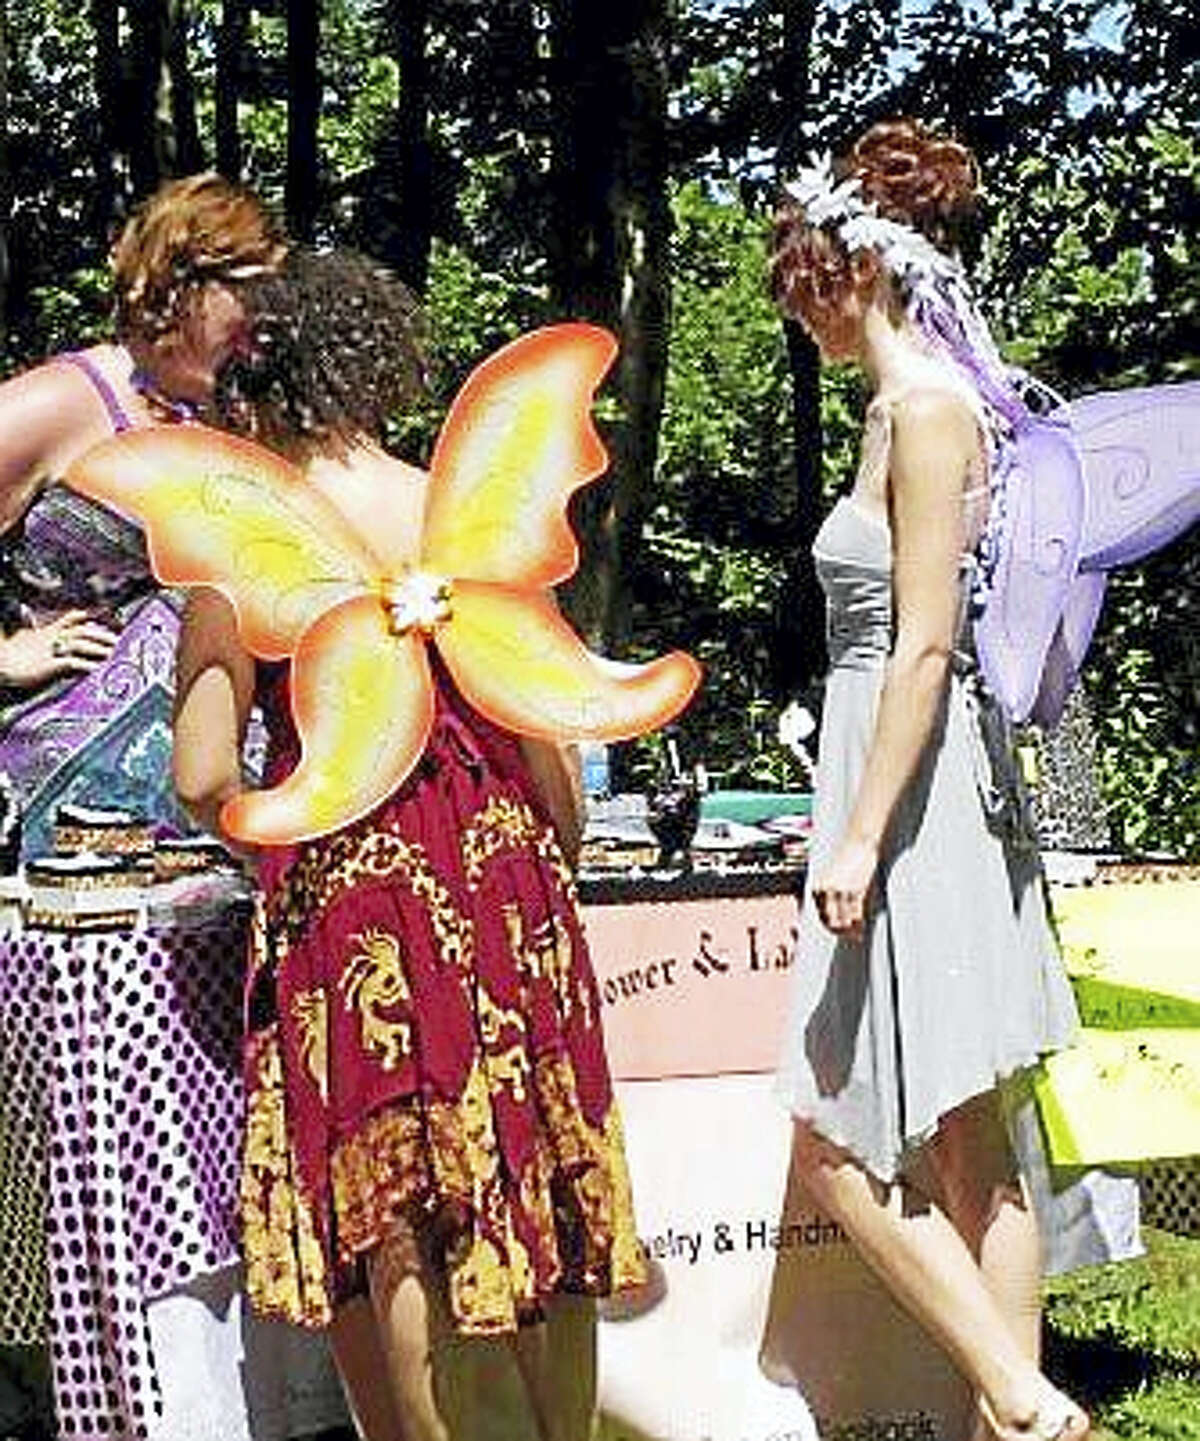 Flanders faerie fair